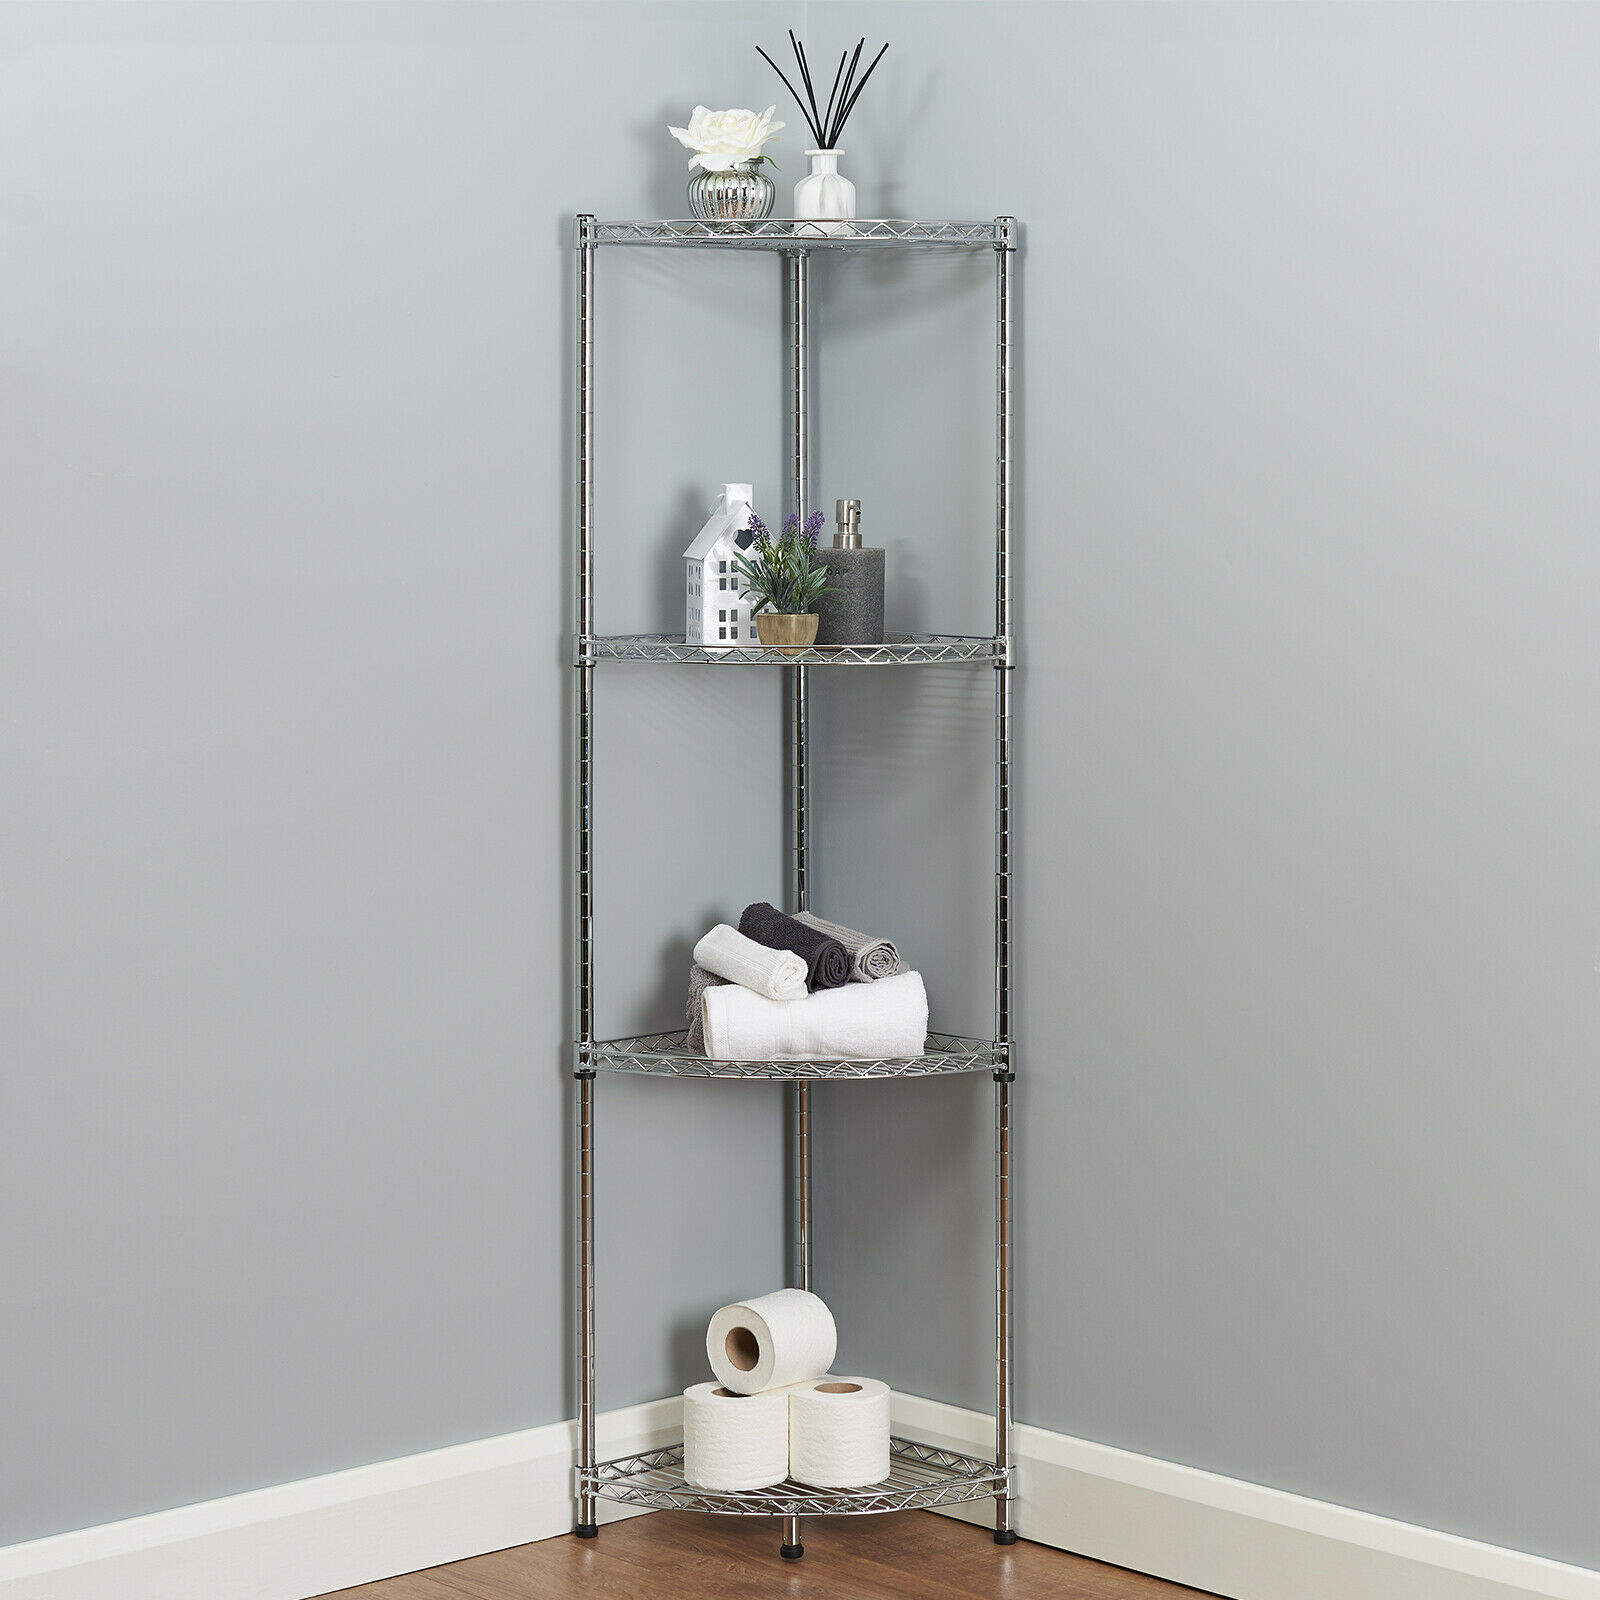 4 Tier Corner Bathroom Storage Shelves